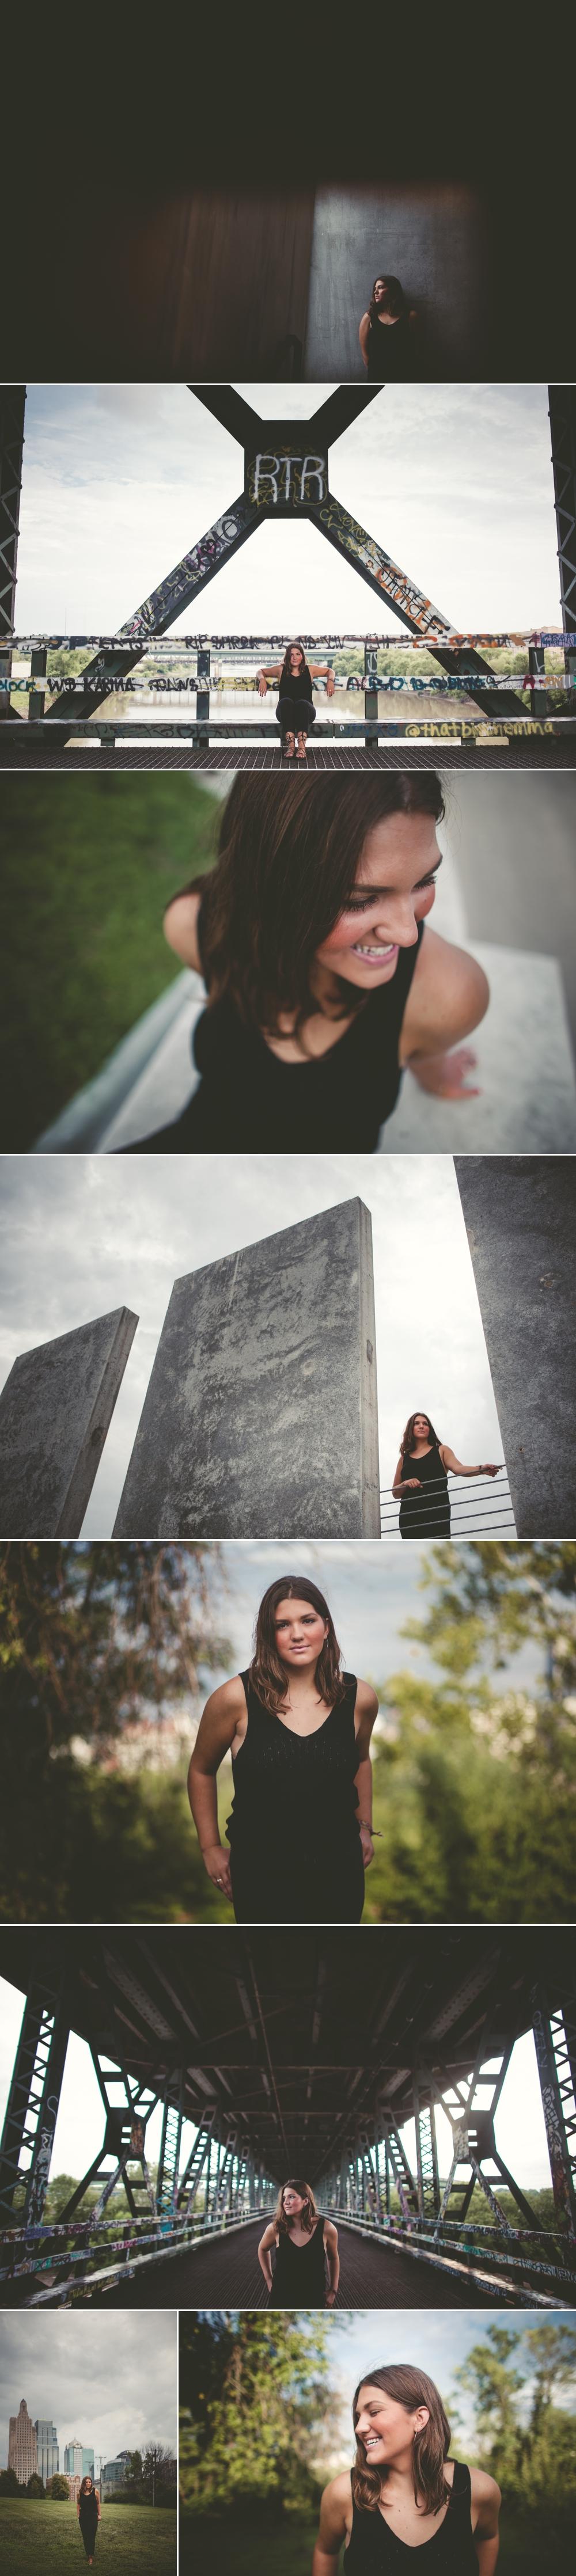 jason_domingues_photography_best_kansas_city_photographer_senior_portraits_01